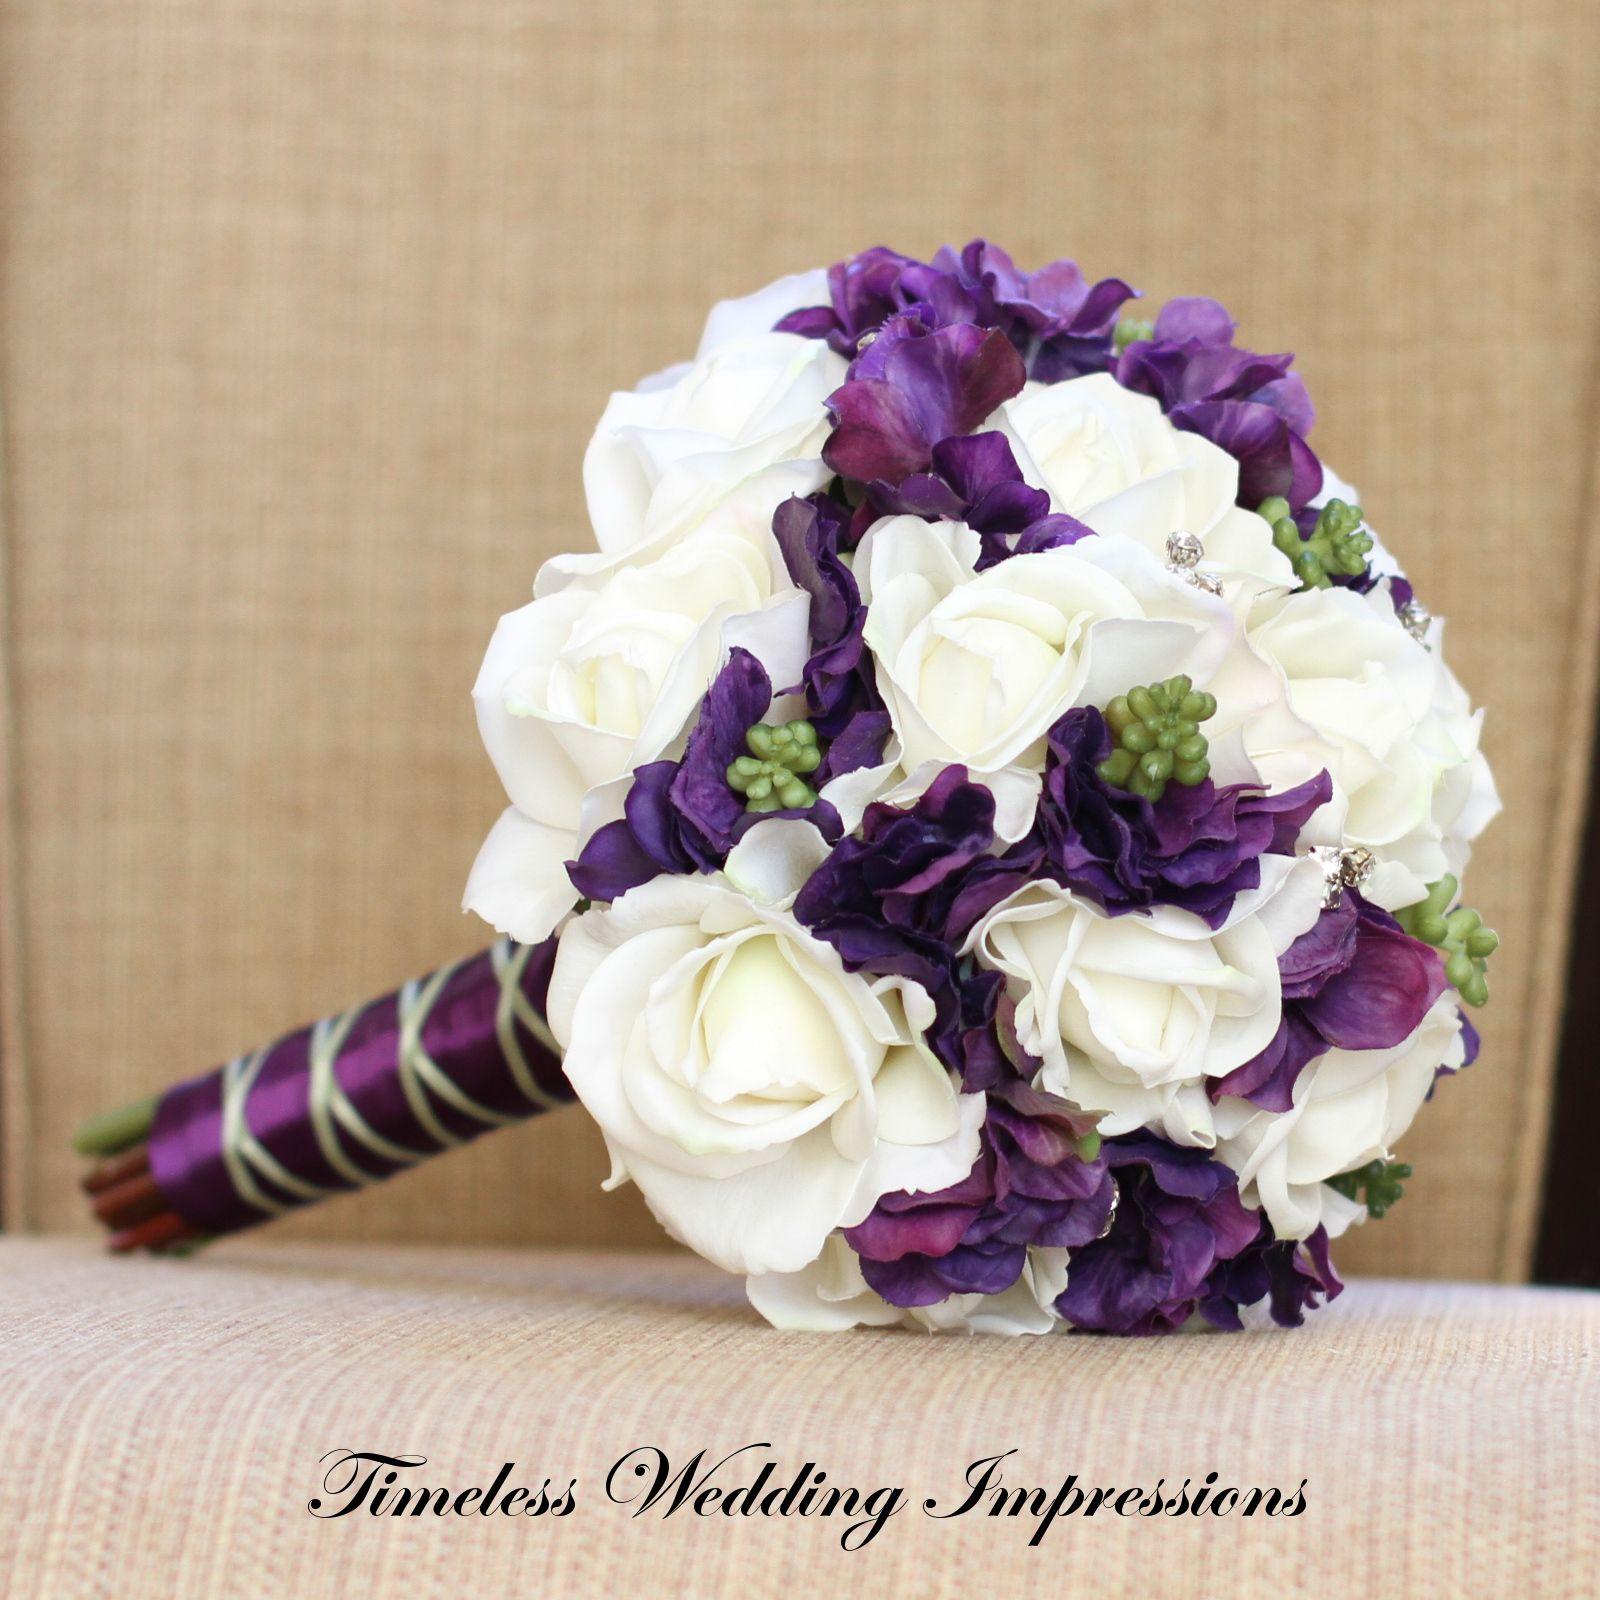 magnolia and purple bridal bouquet - Google Search | Wedding Likes ...